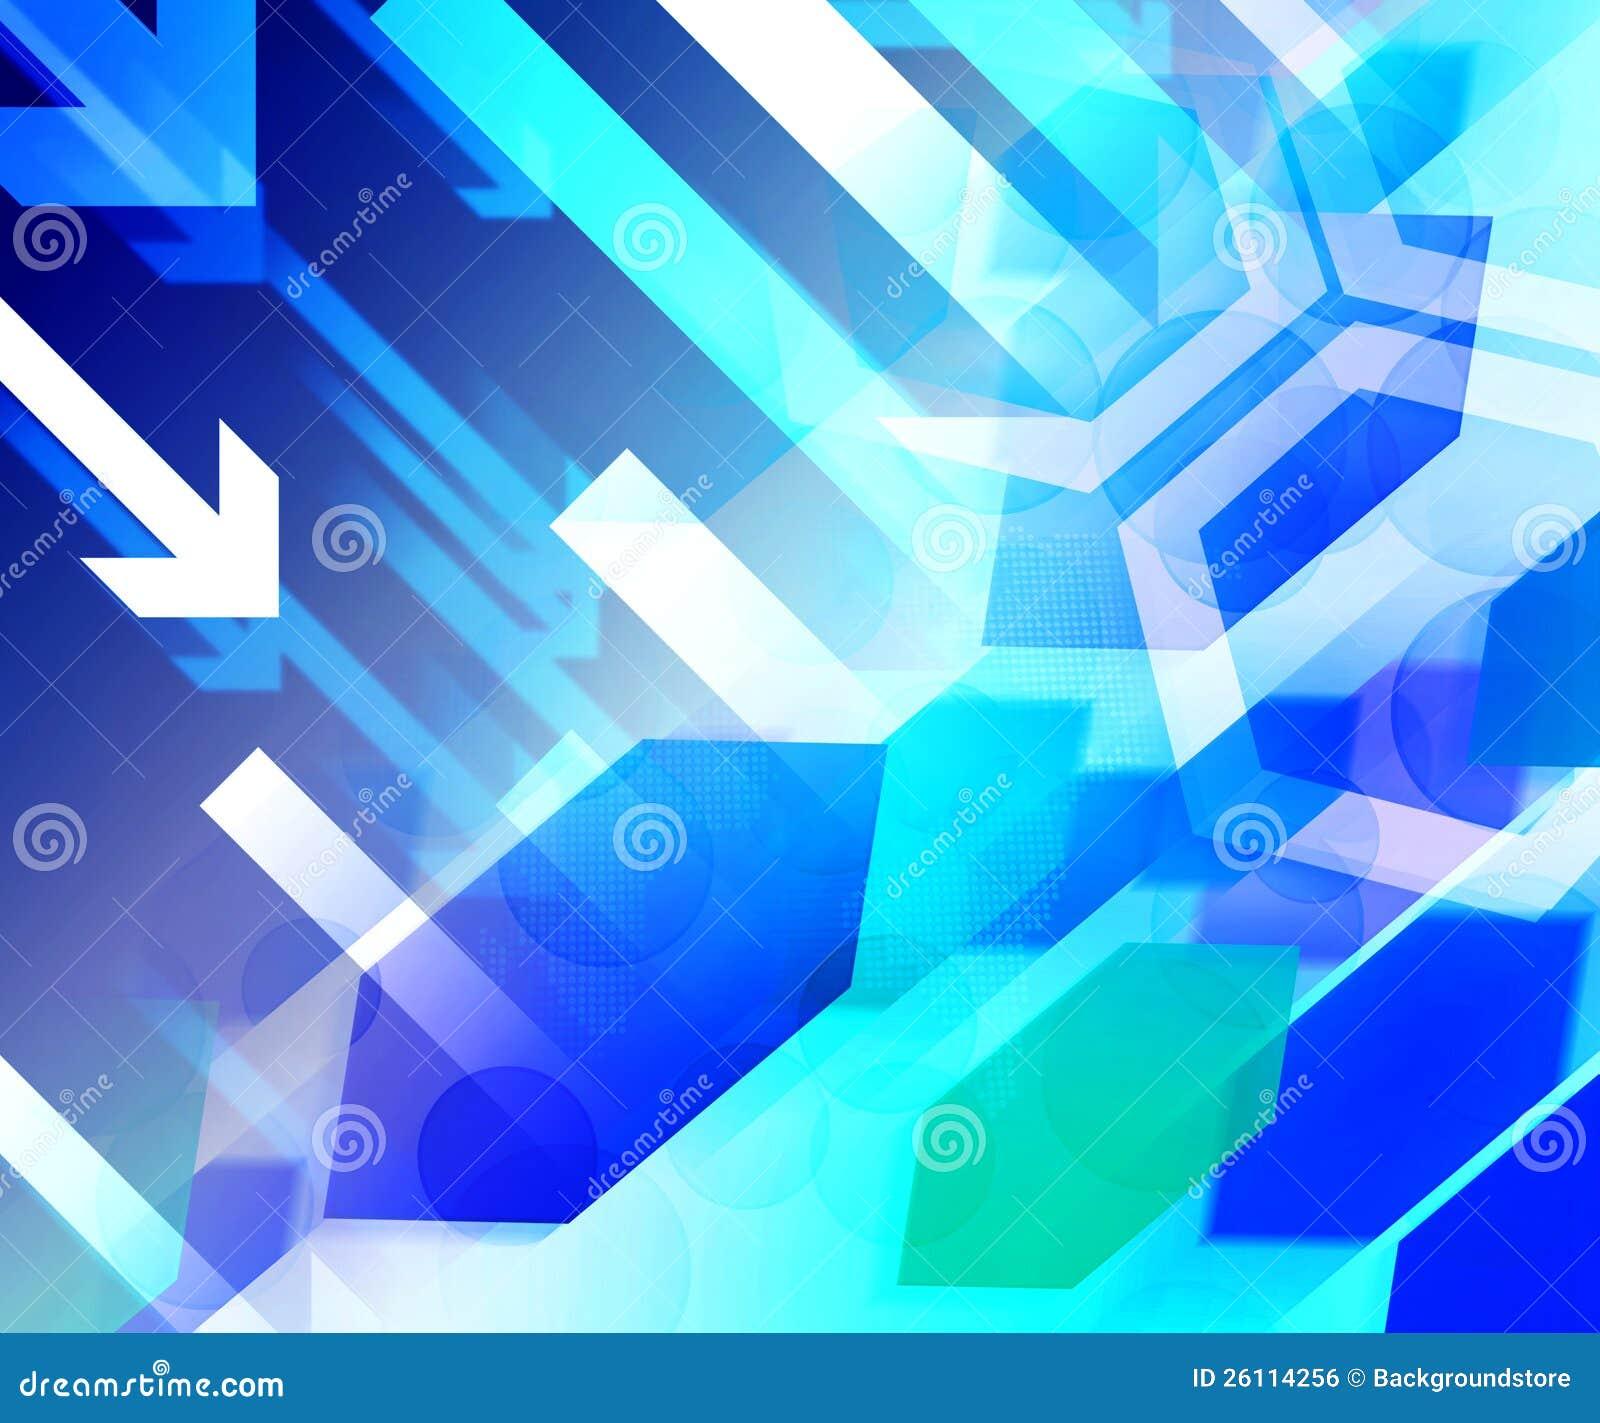 Finance Background: Blue Business Finance Background Royalty Free Stock Image